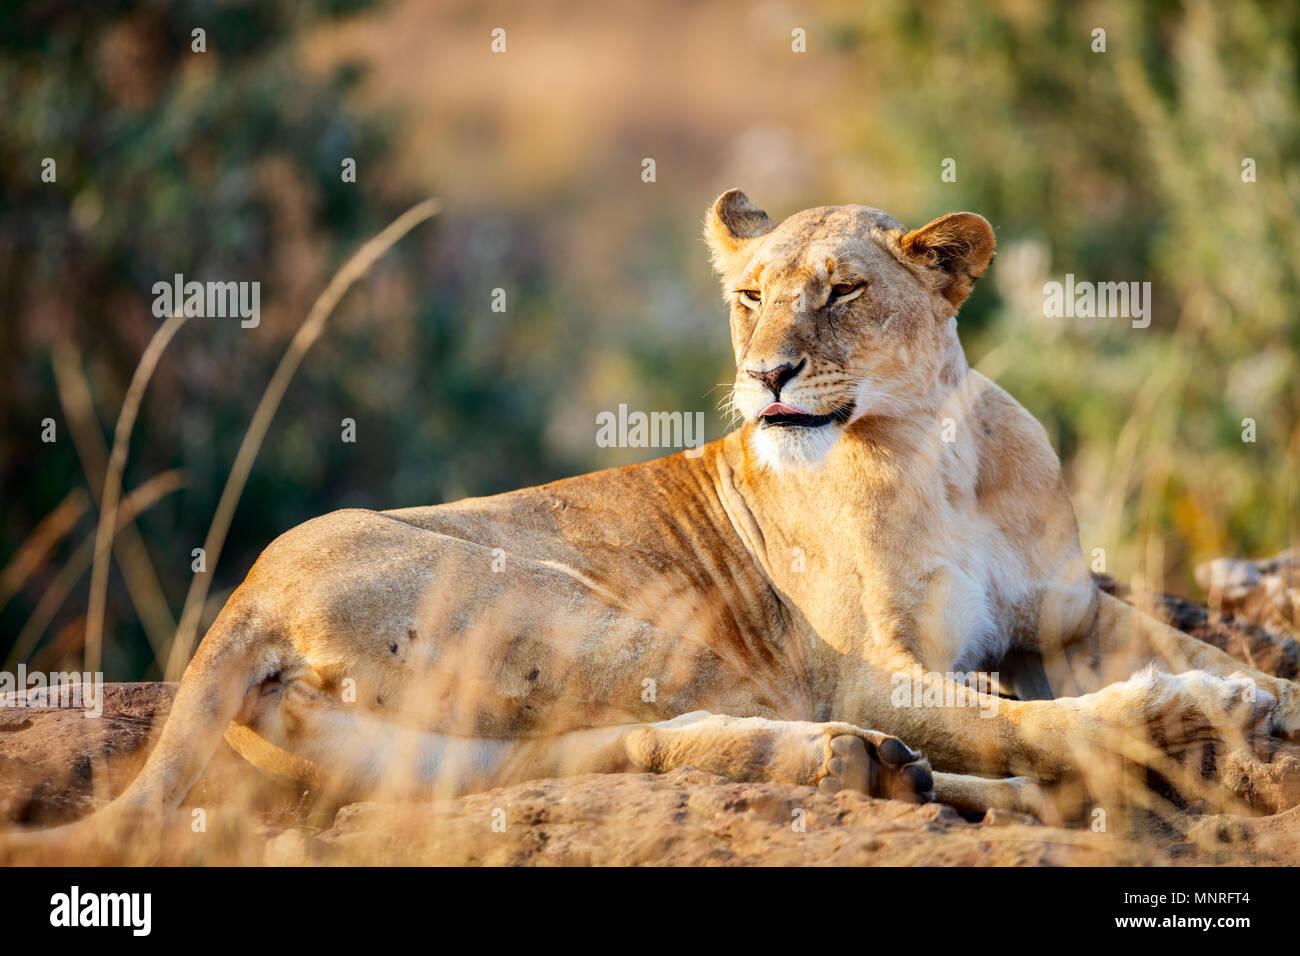 Leone femmina nella riserva nazionale in Kenya Immagini Stock